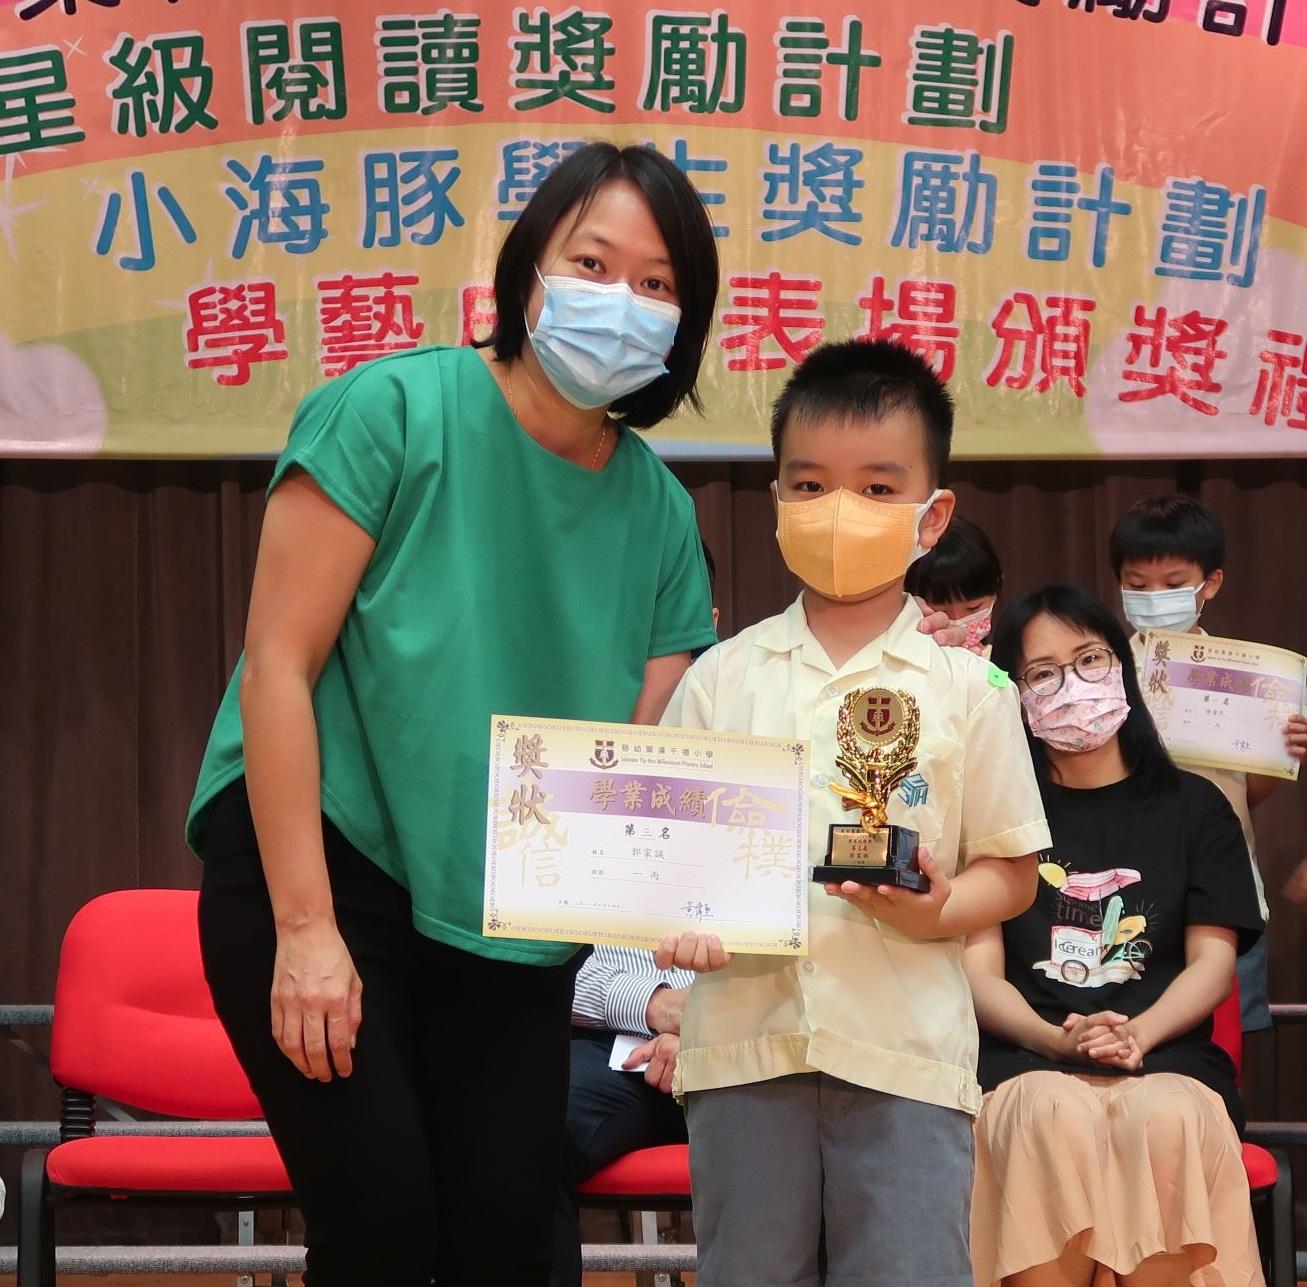 https://syh.edu.hk/sites/default/files/img_5380.jpg